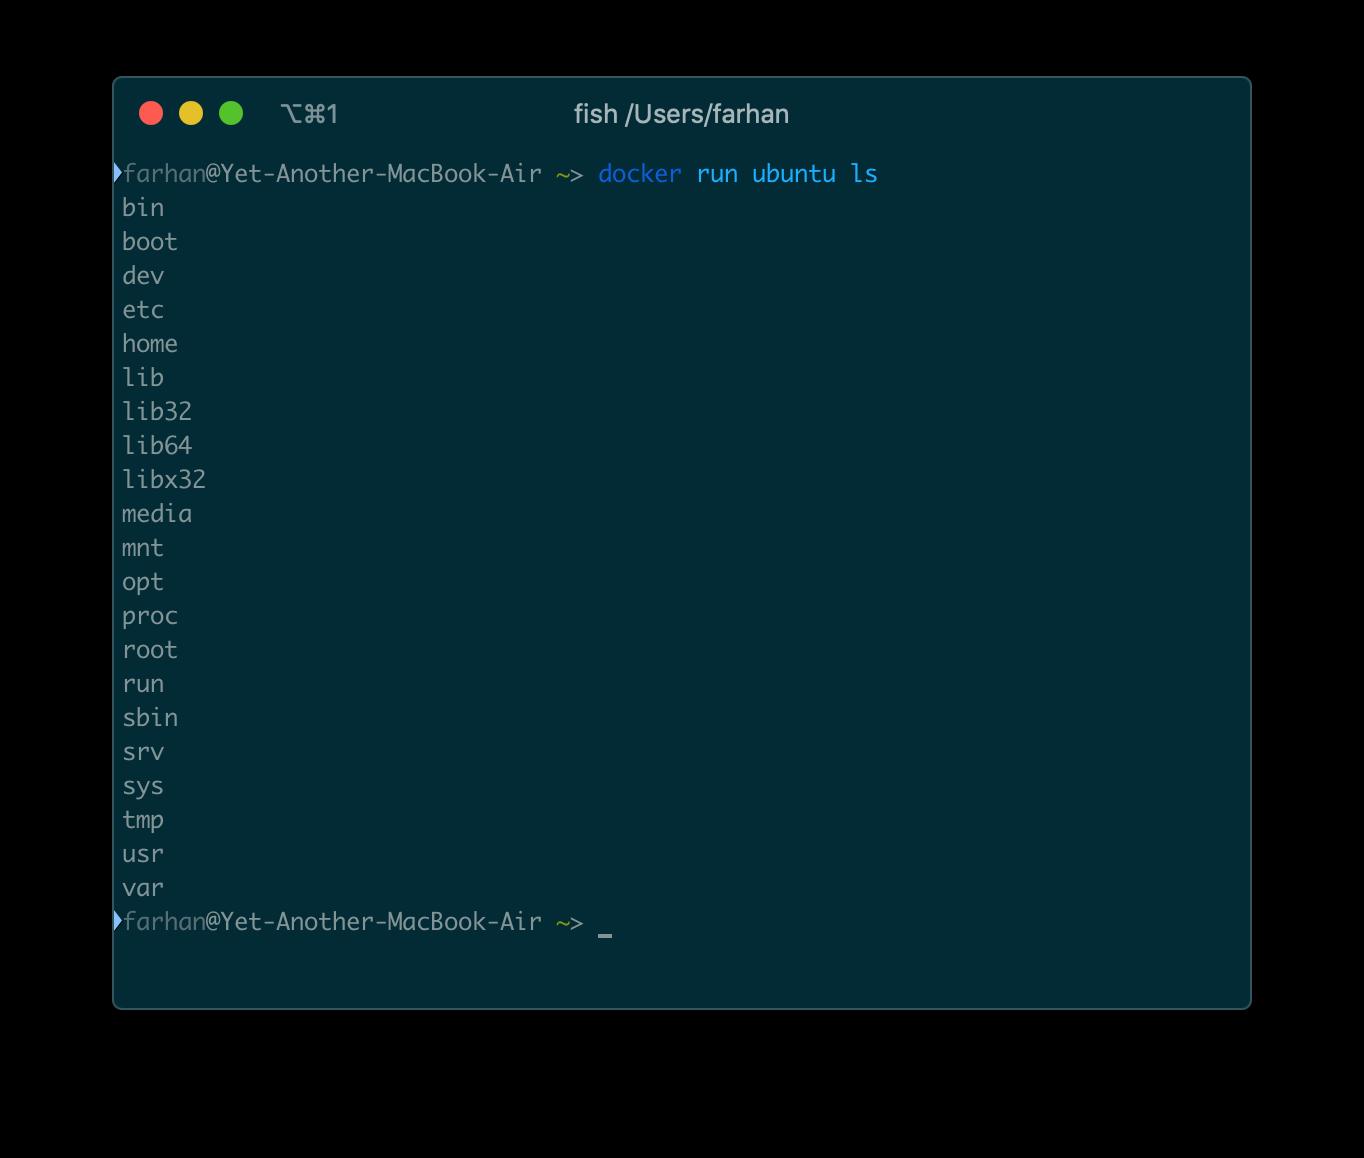 docker run ubuntu ls コマンドからの出力